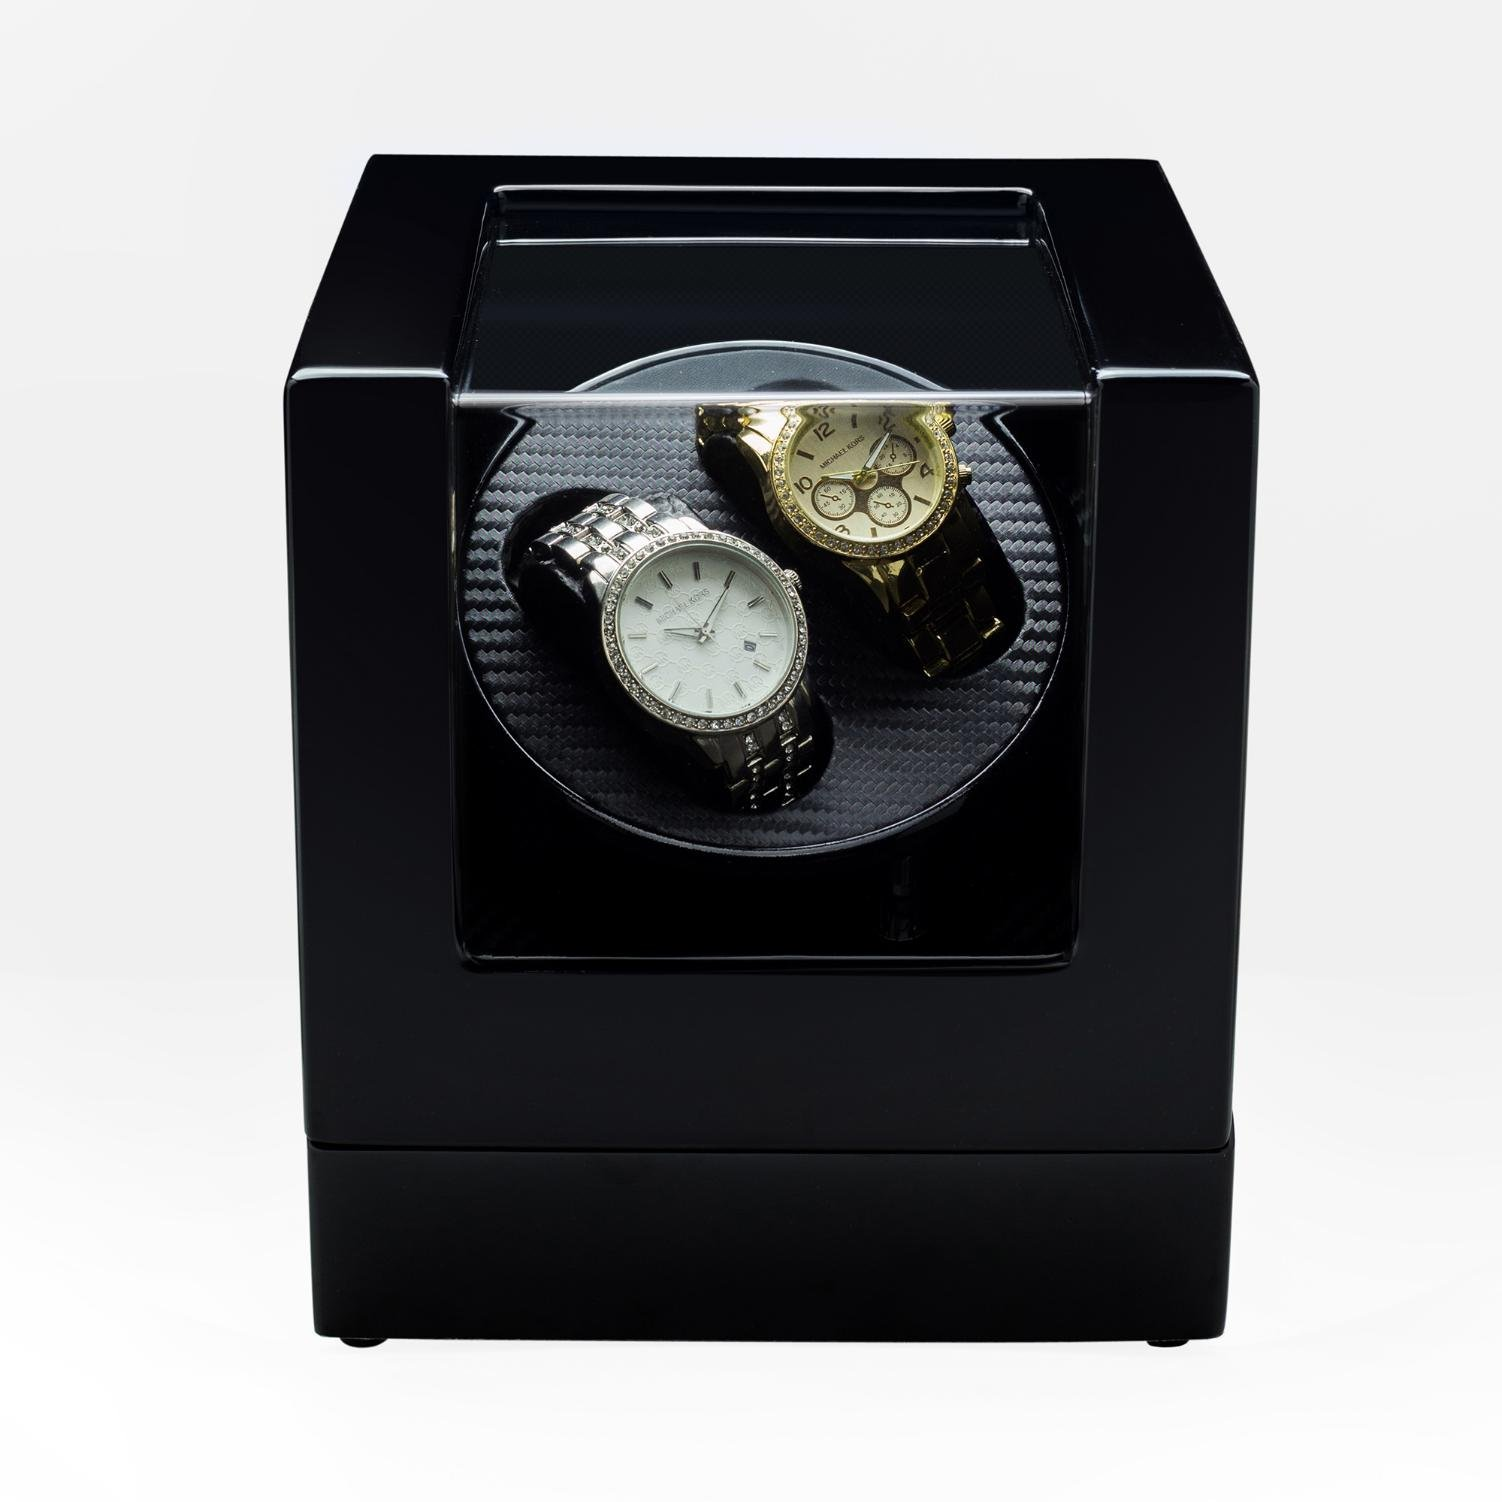 jianbo Automatic Watch Winders Winder storages box Display Box Case Quiet Mabuchi Motors WB6931 , C